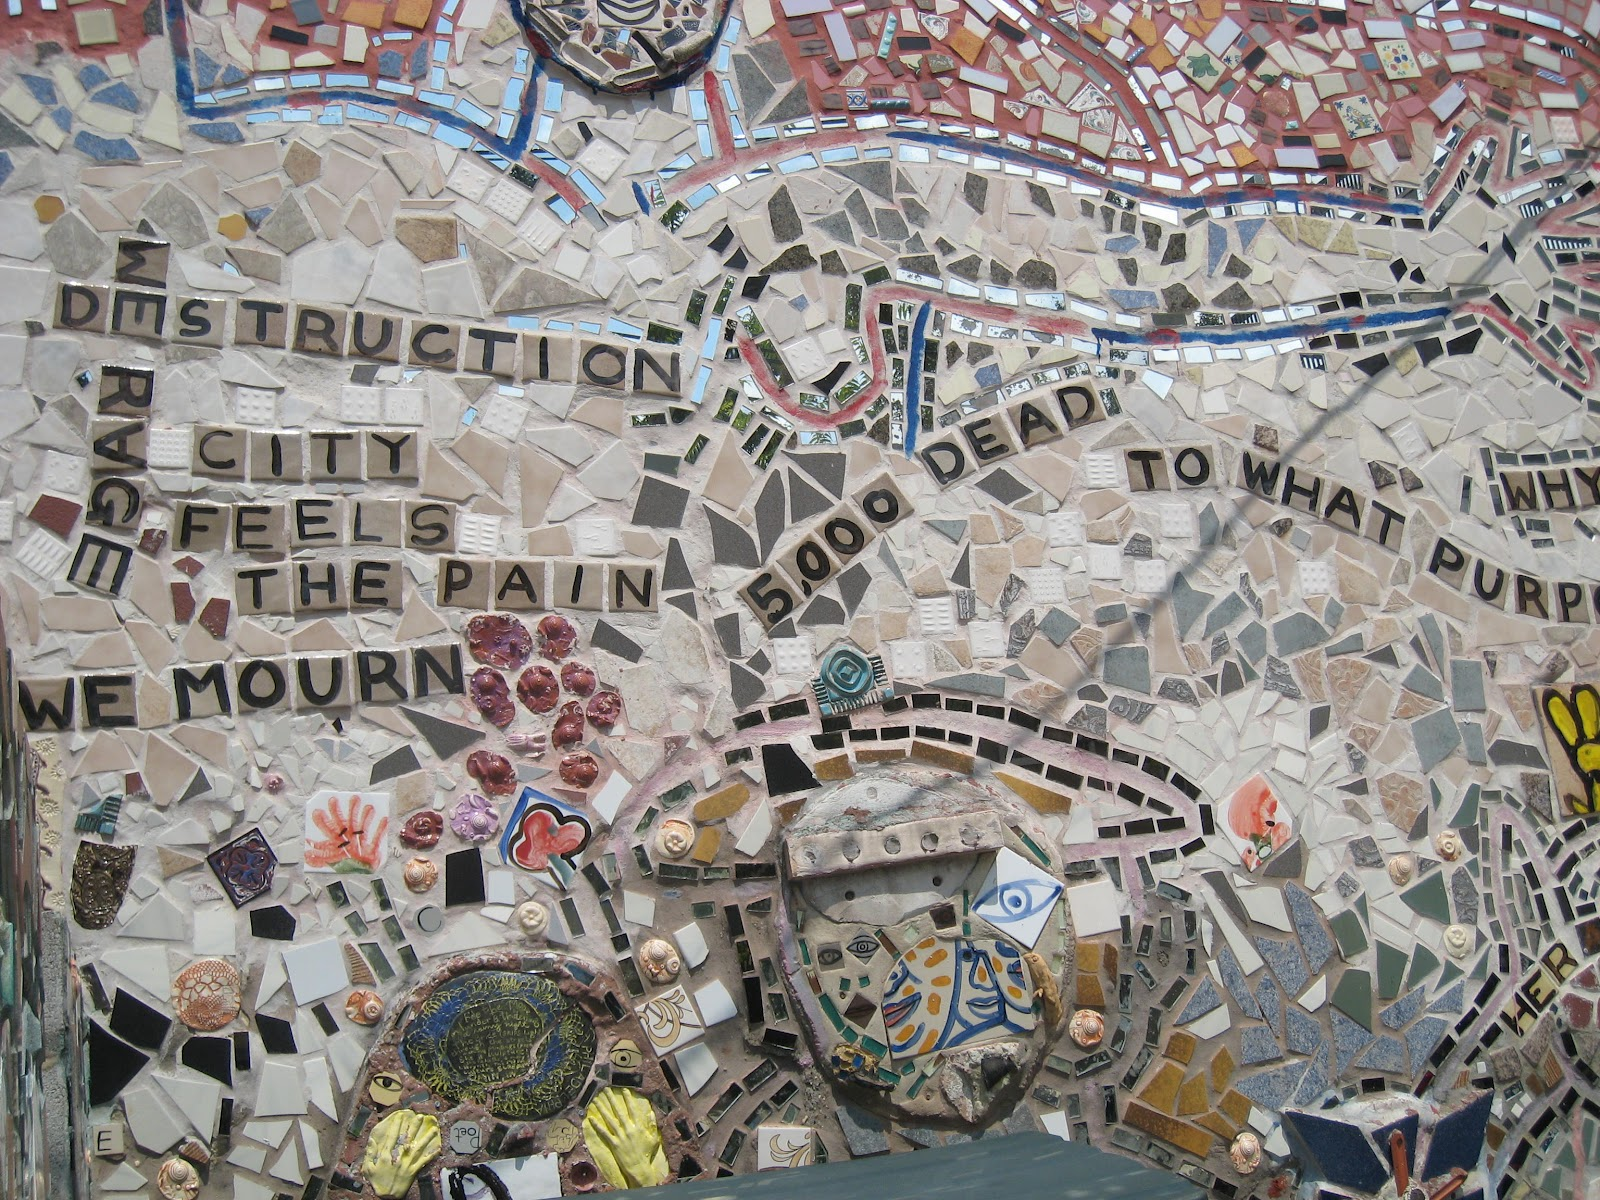 Spam Is Better Fried Mosaic of Life Philadelphia Magic Gardens